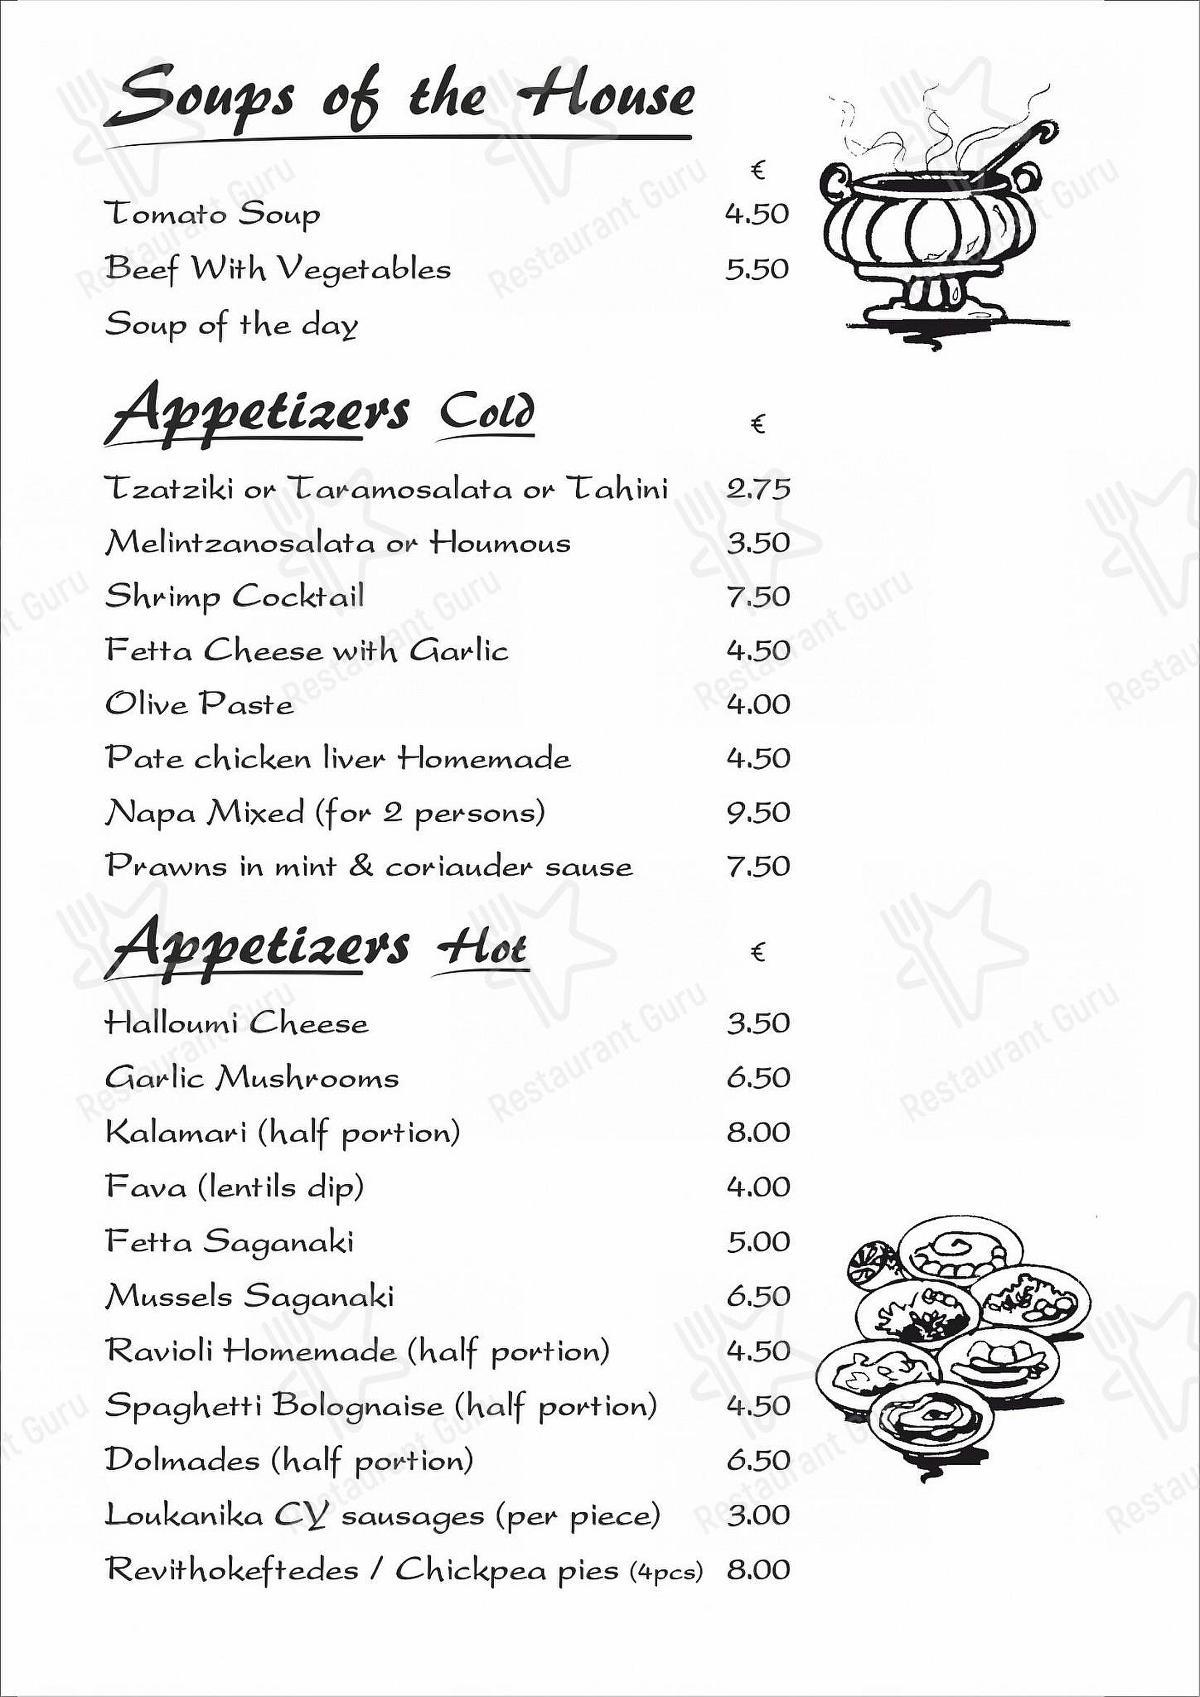 Check out the menu for Taverna Napa